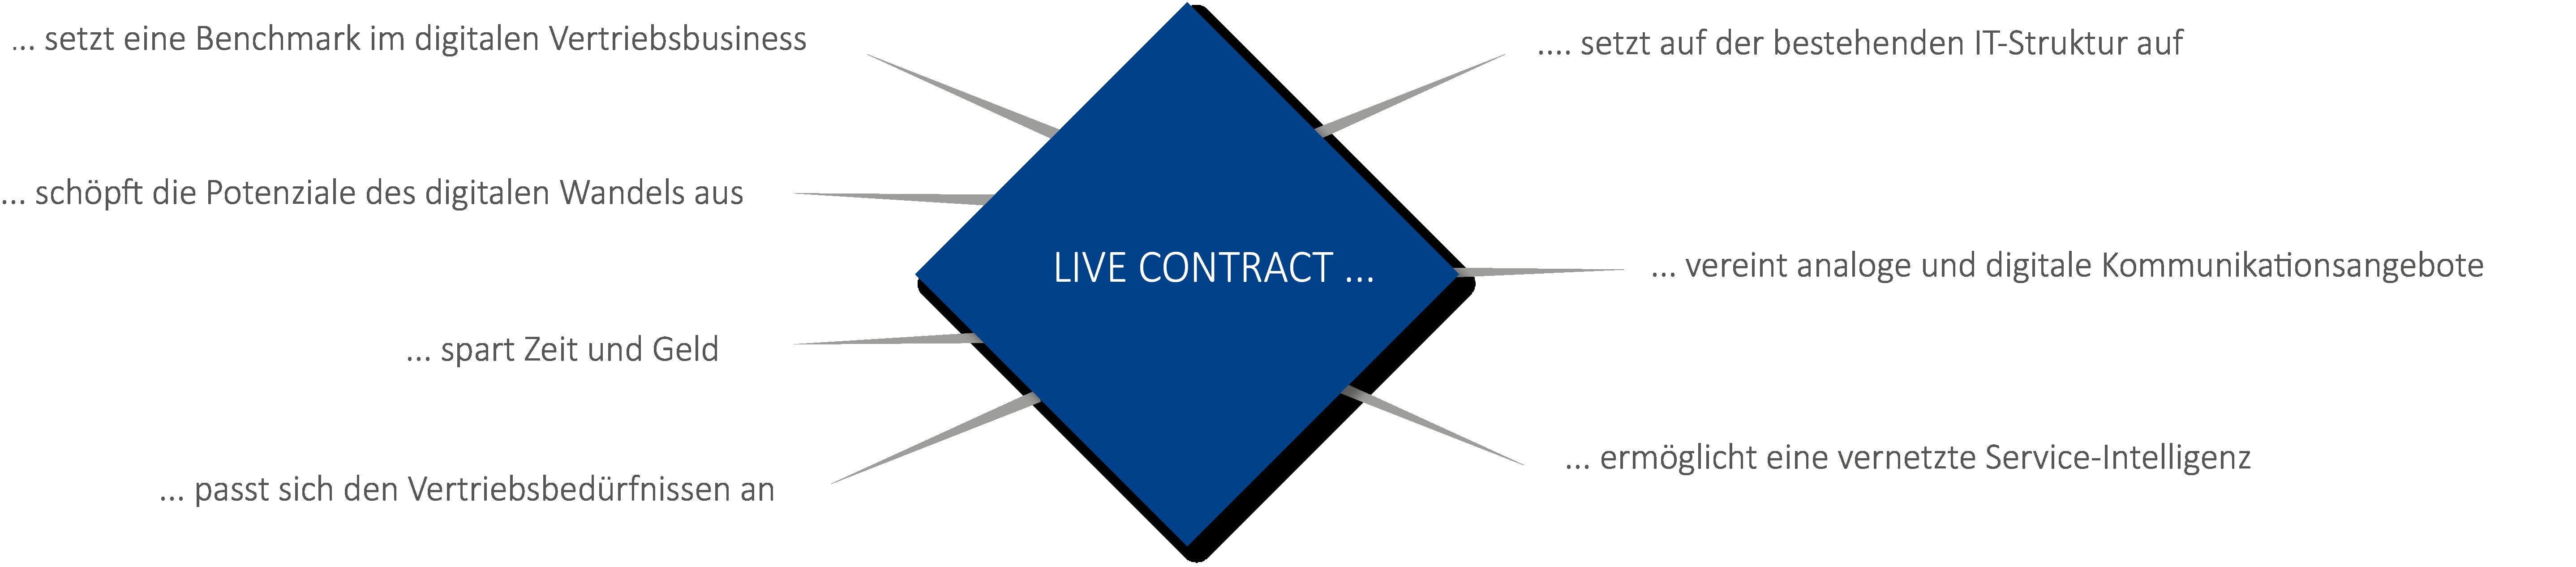 LiveContract